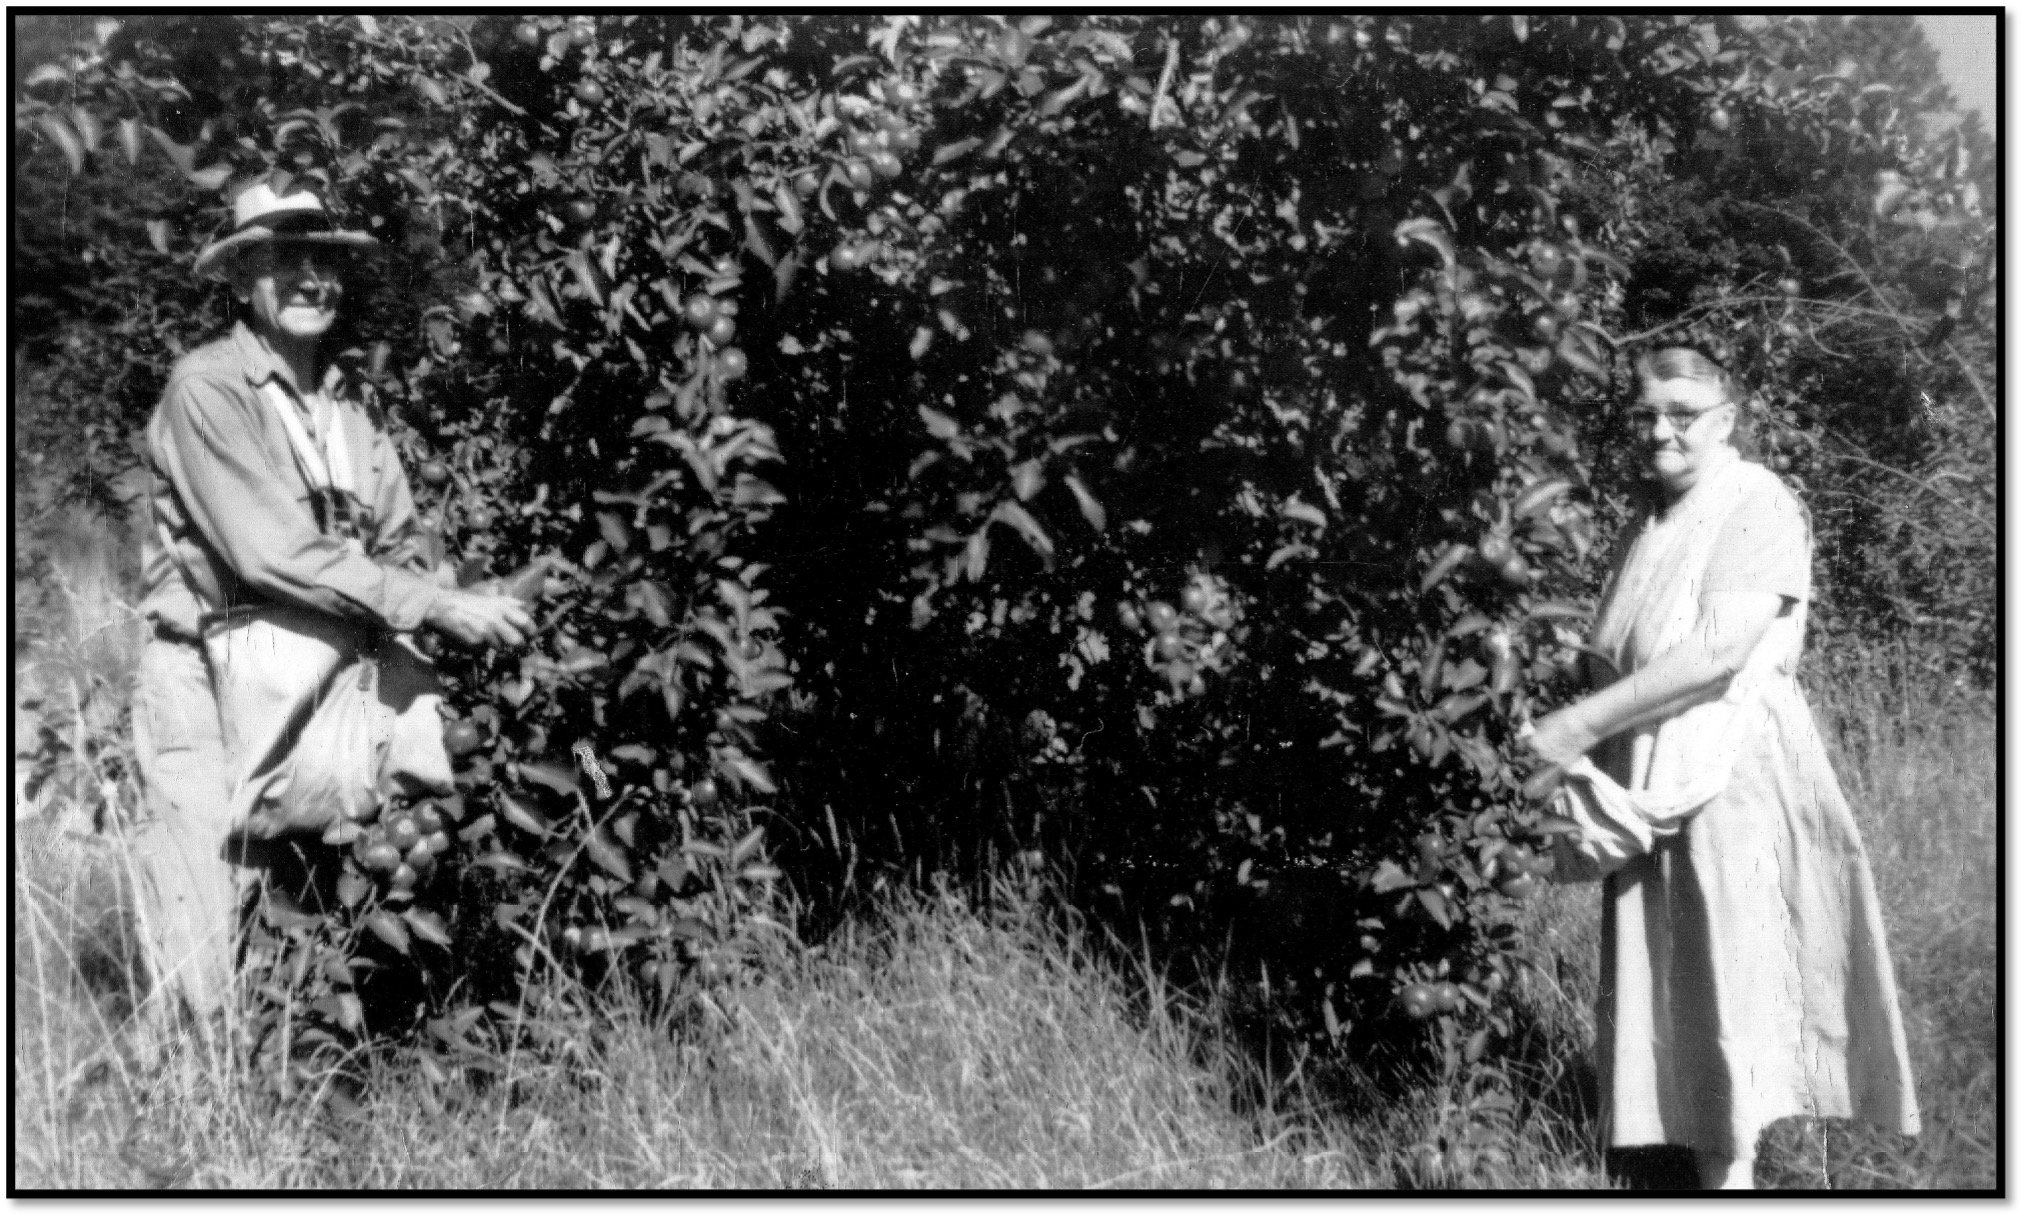 Martin and Christine Erickson picking Cortland apples on the old Erickson farm ca 1960s